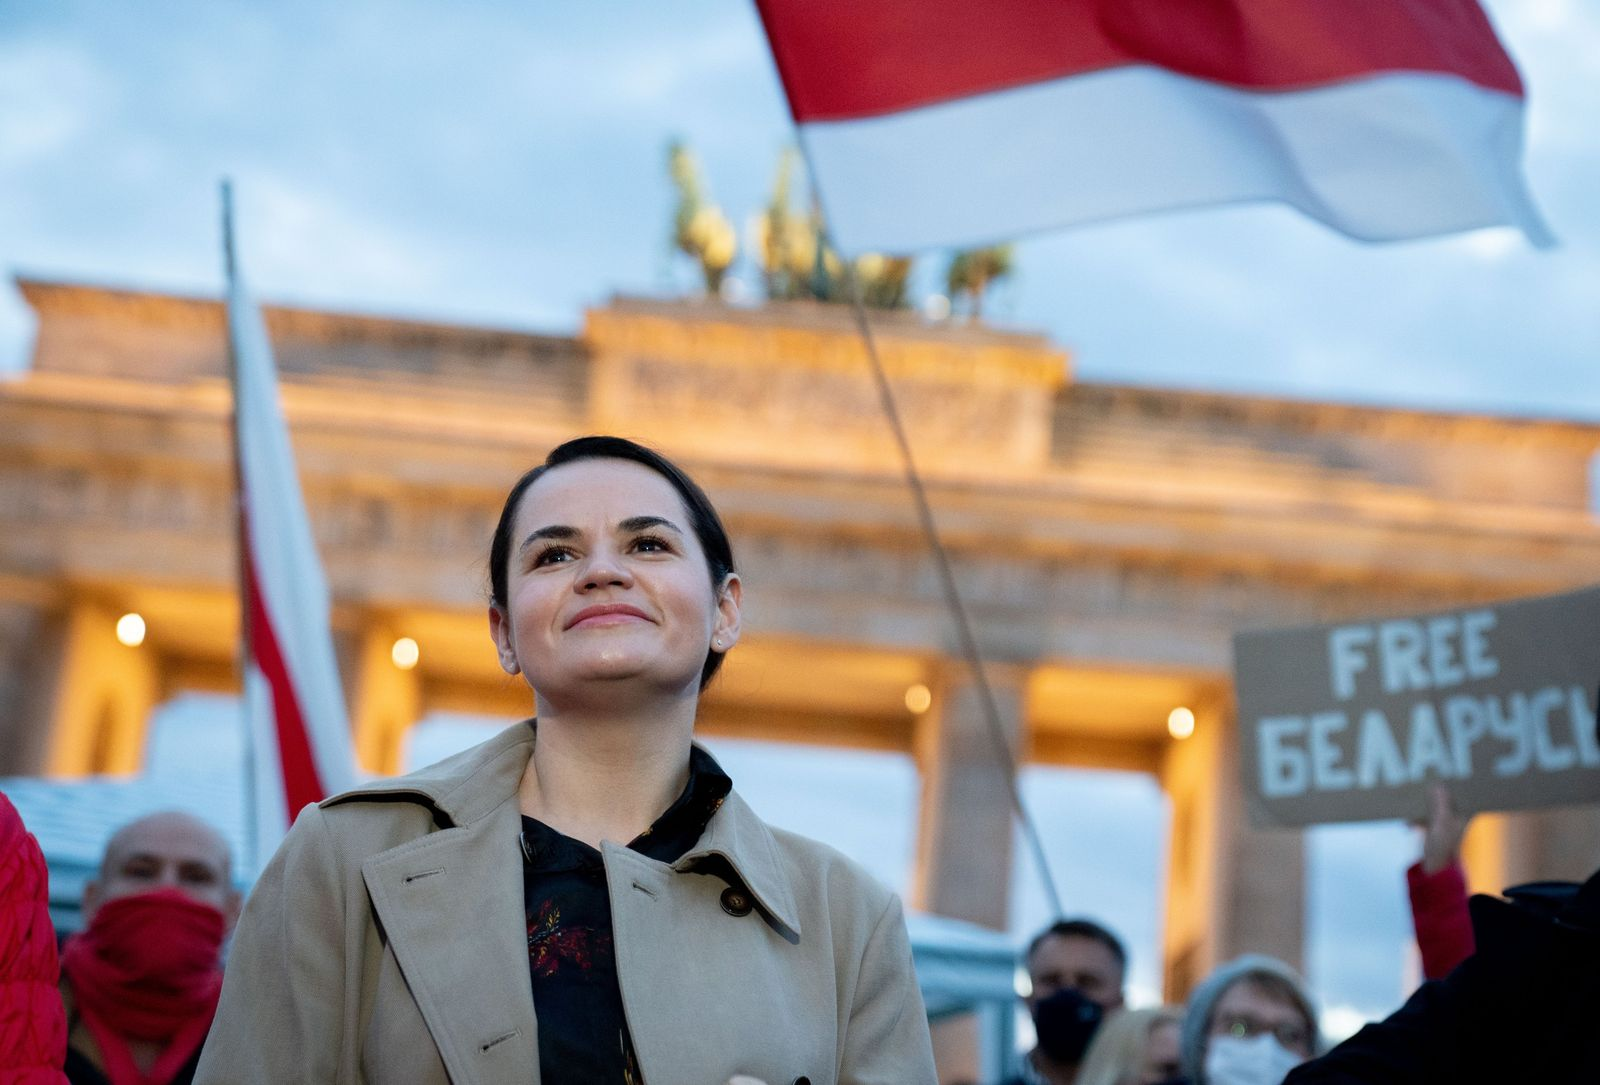 Belarussische Oppositionsführerin Tichanowskaja in Berlin